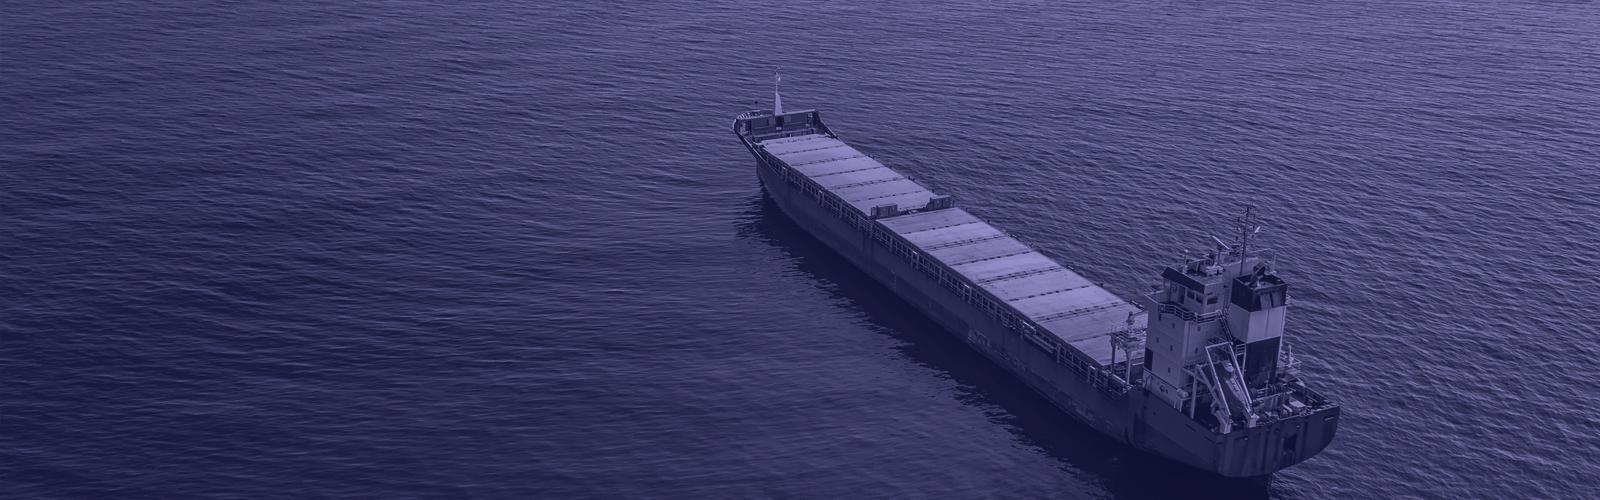 eyesea-shipping